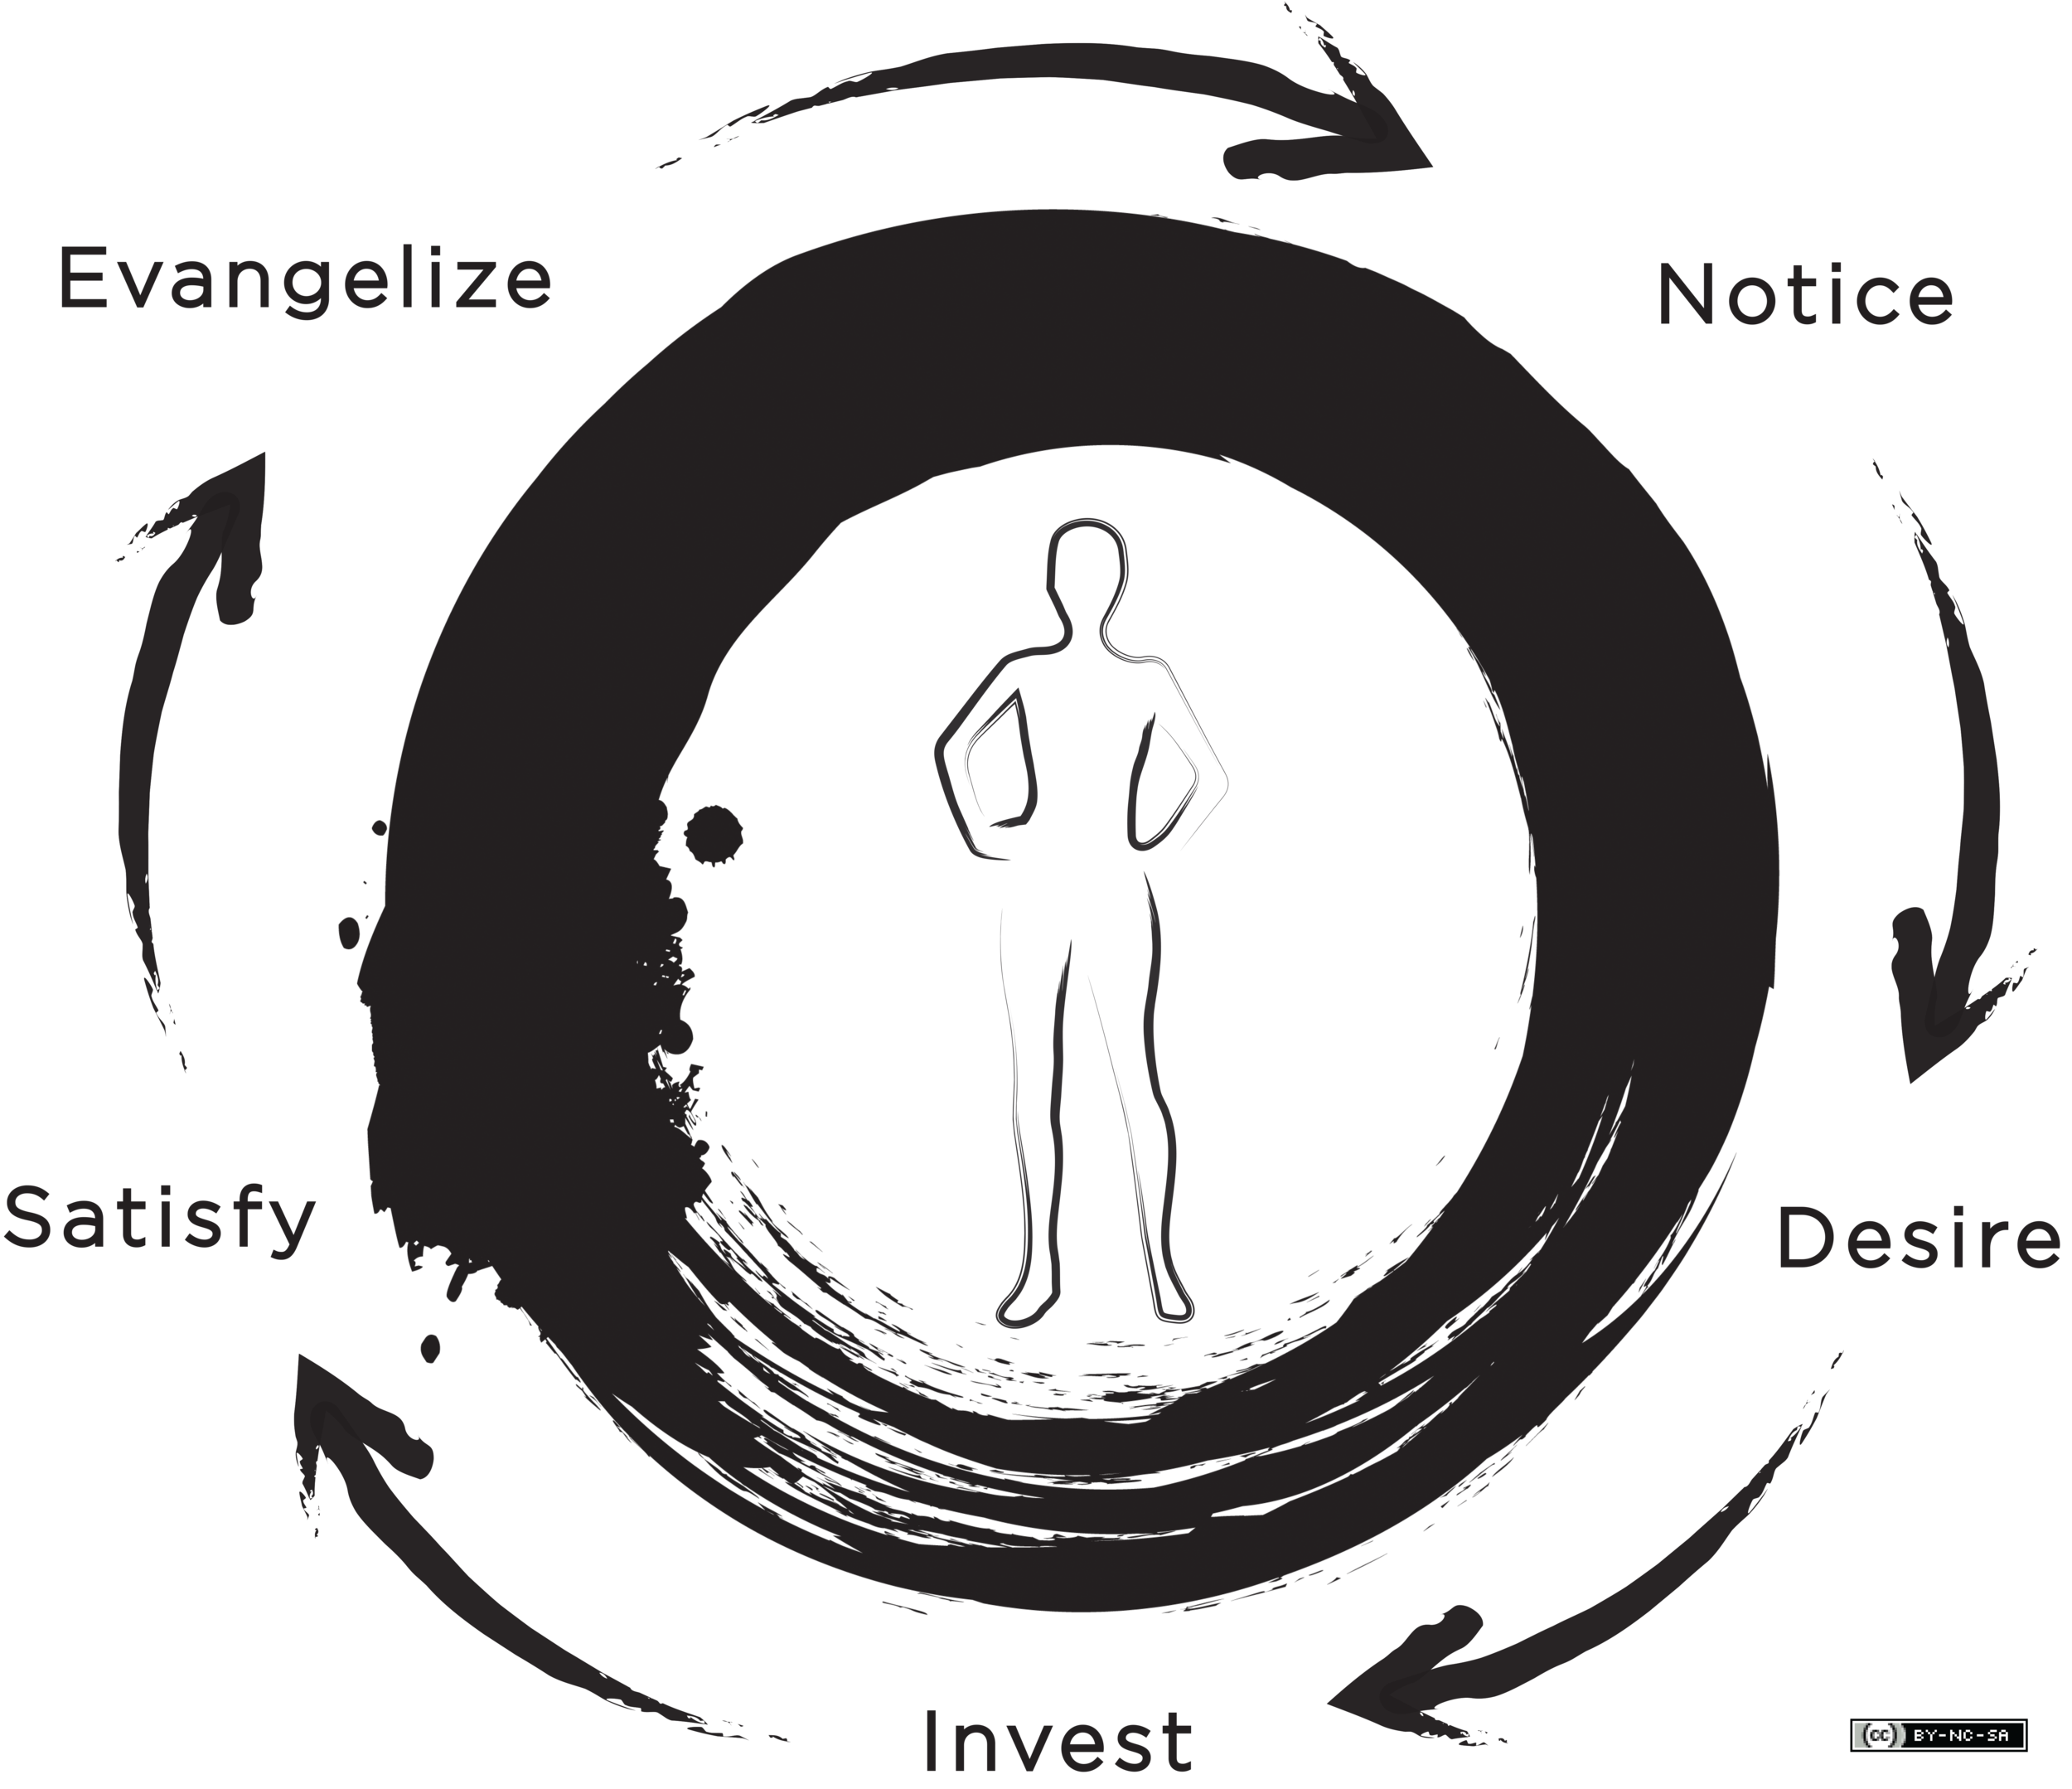 THE HARMONIC CYCLE